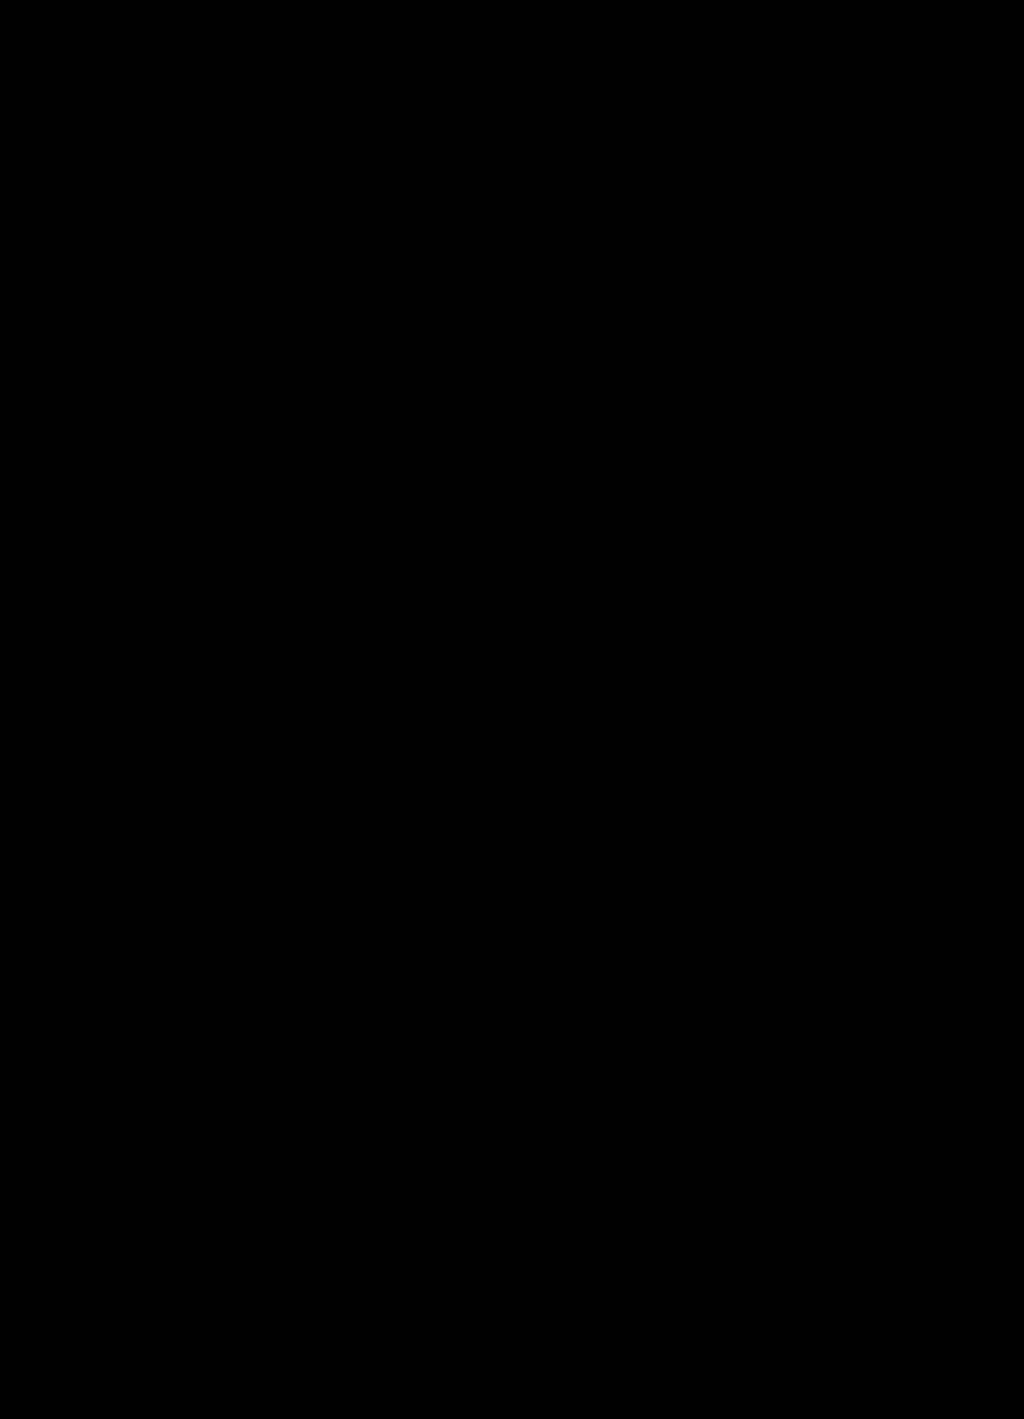 1024x1419 Arachnid Clipart Spiderman Logo